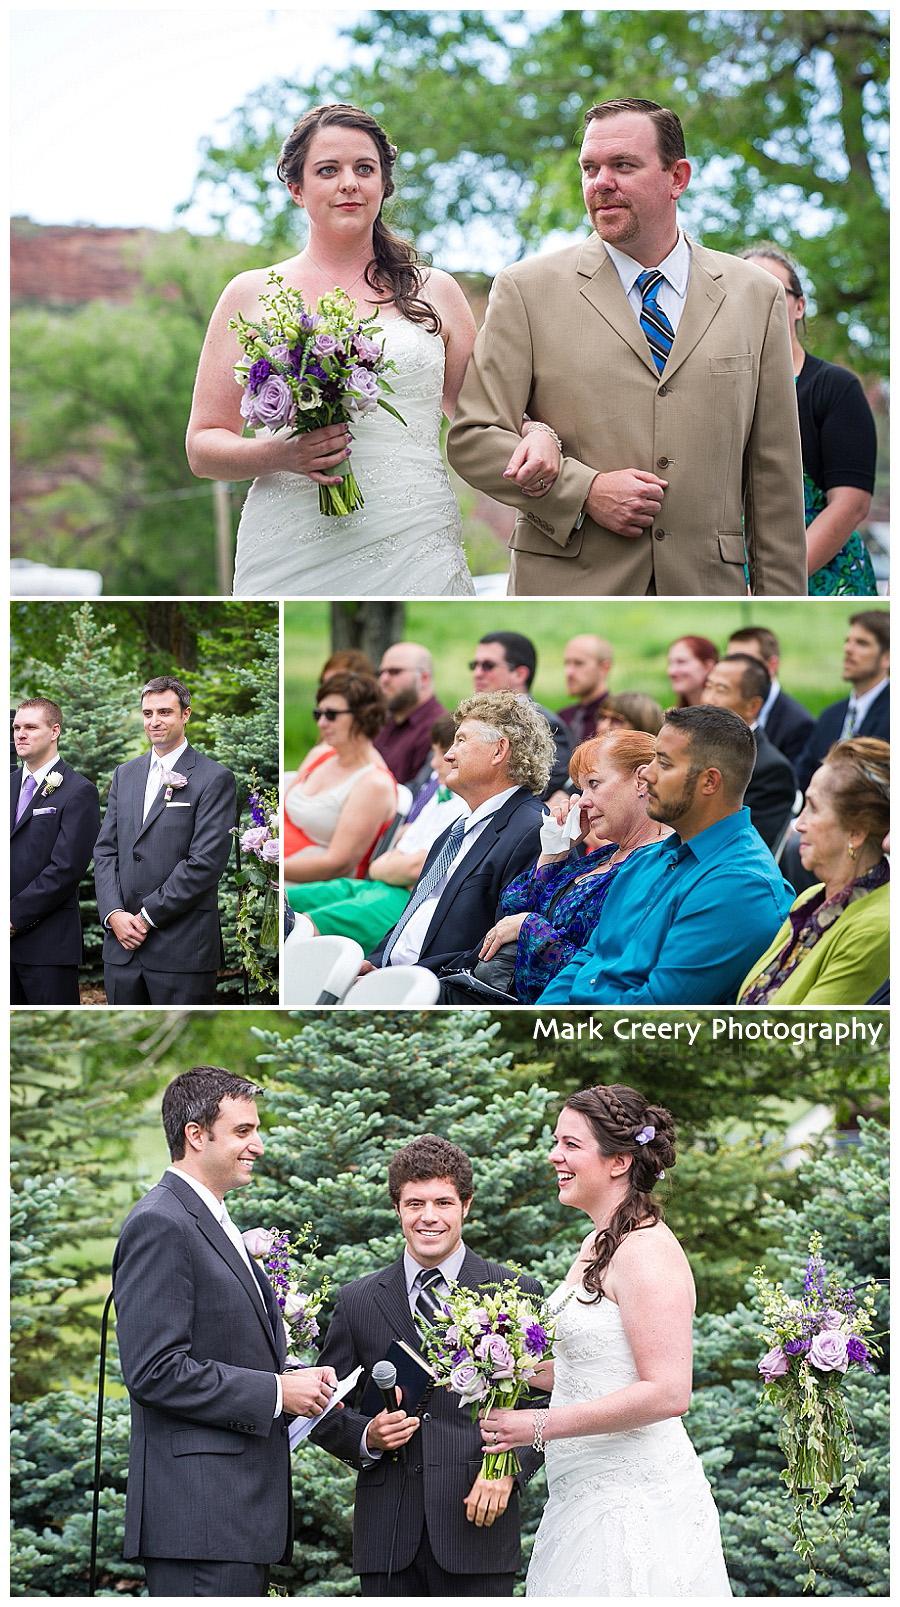 wedding ceremony photos at McC Ranch